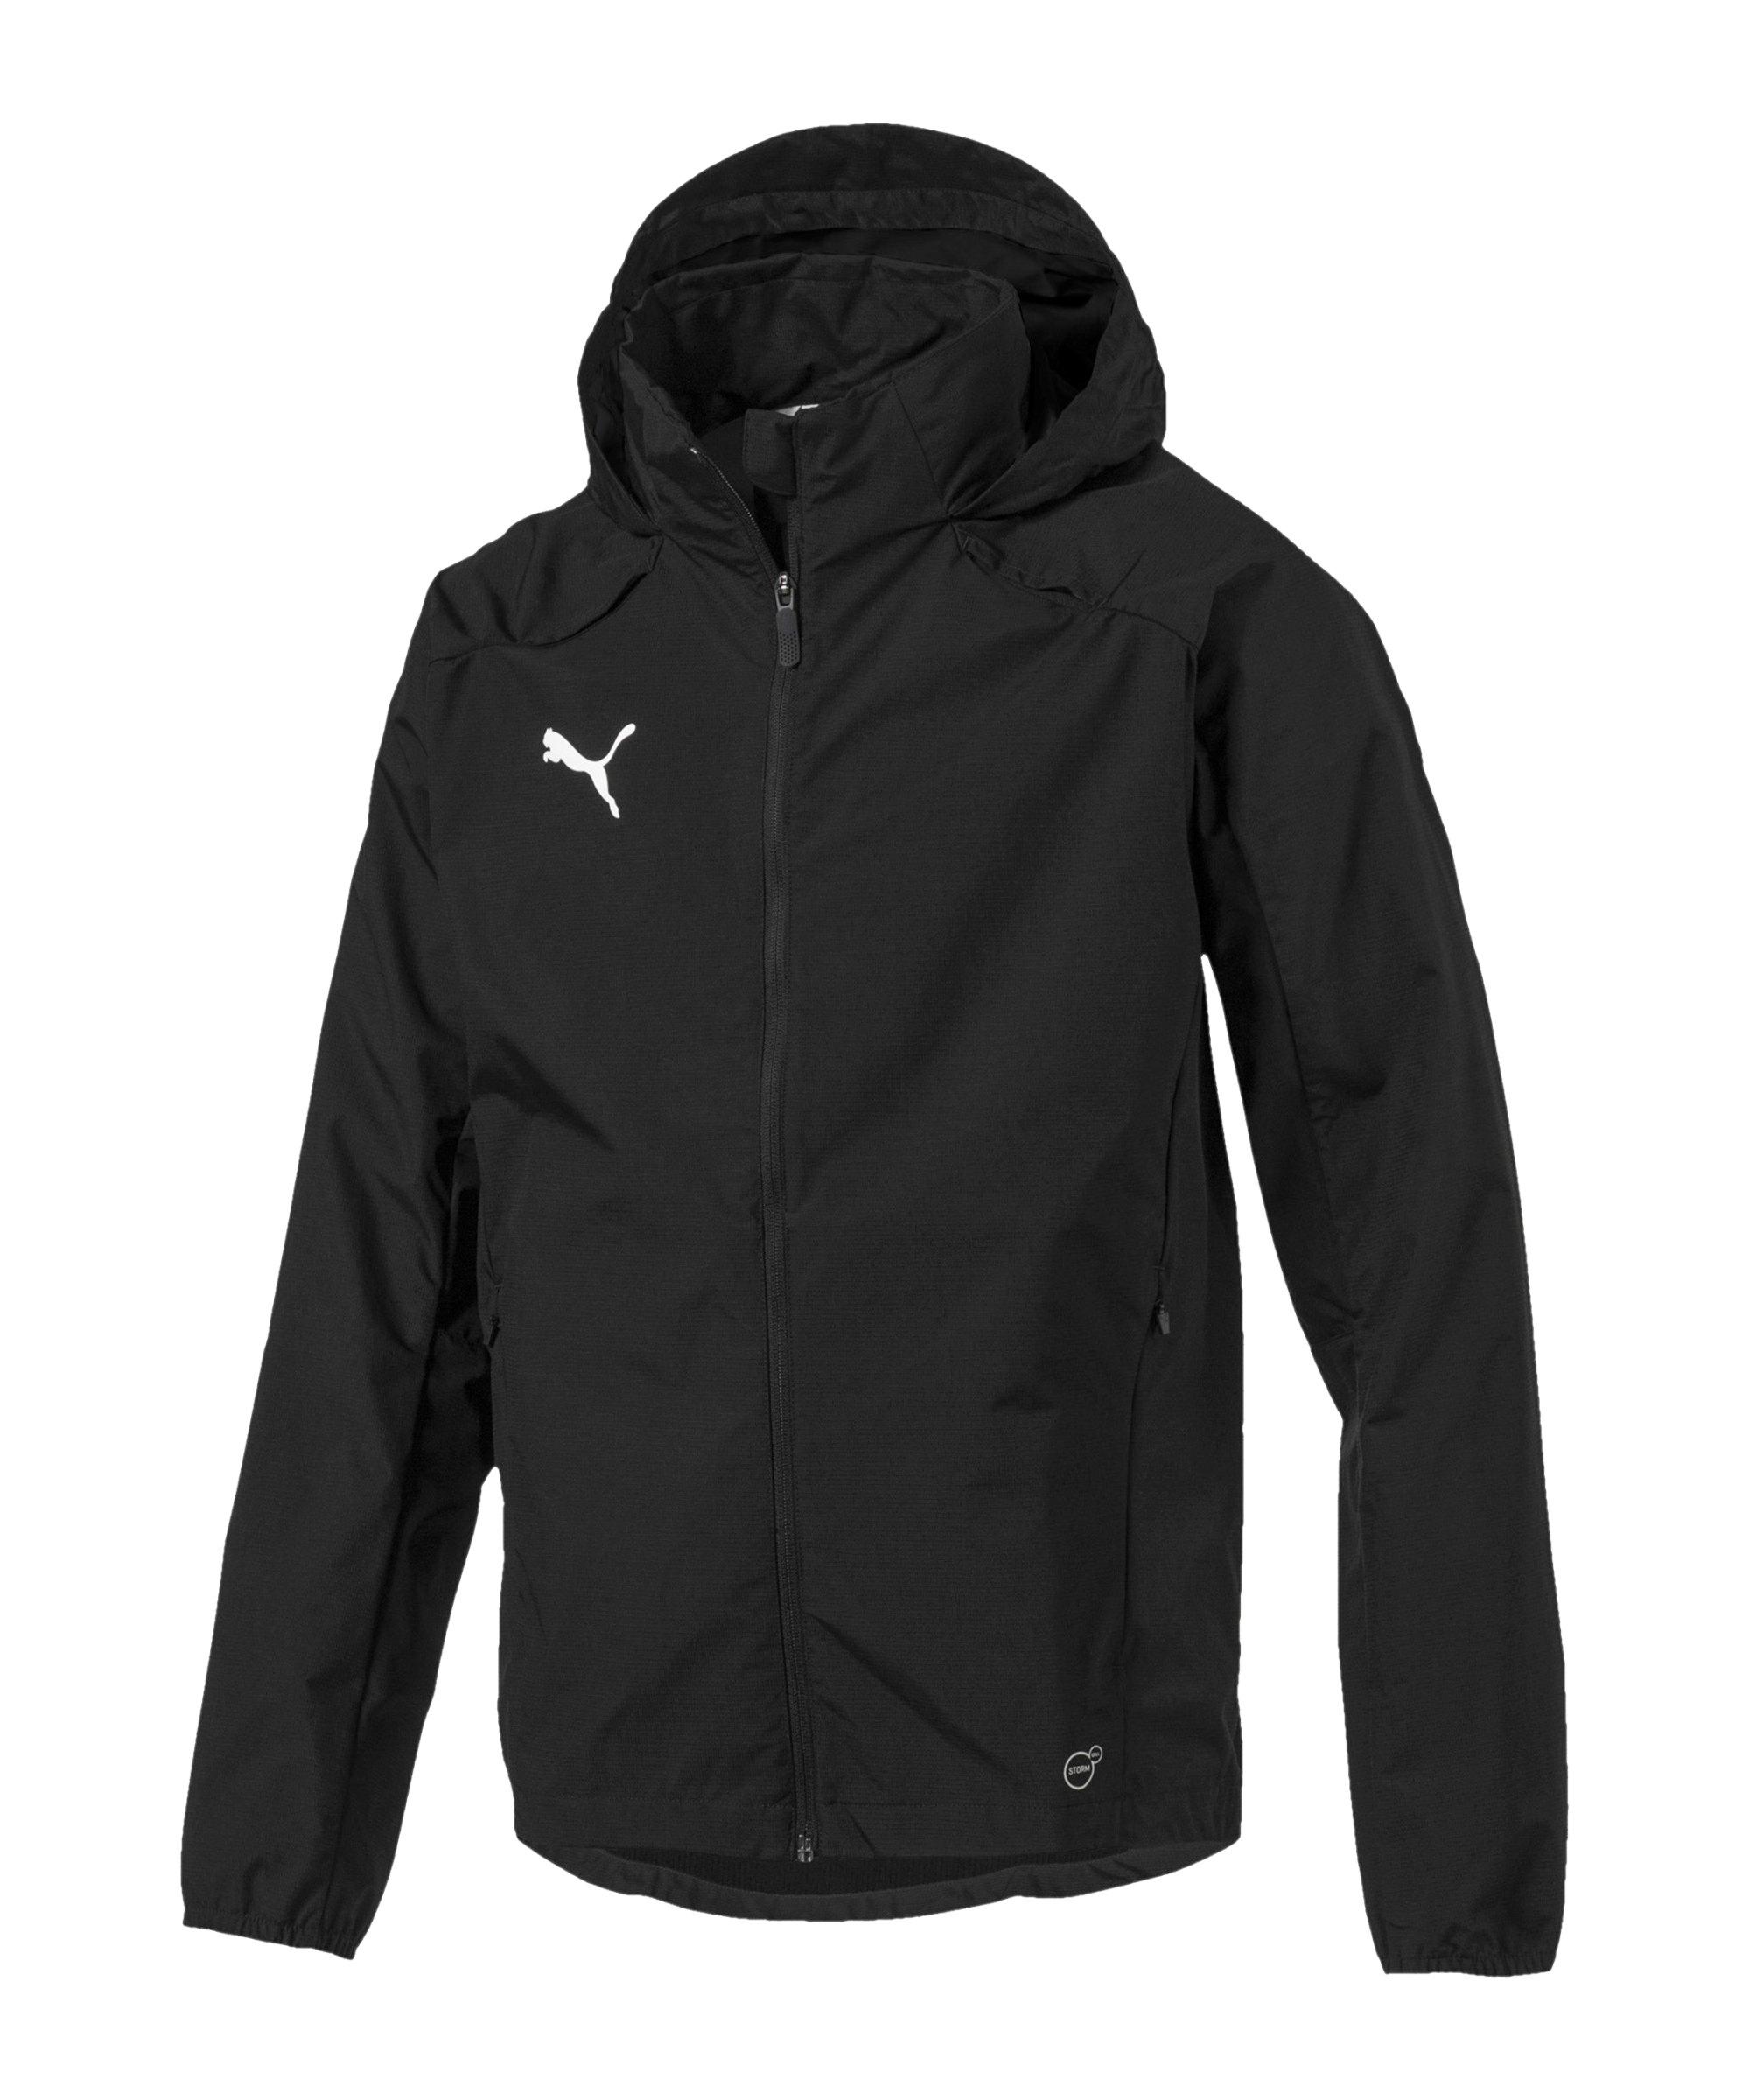 PUMA LIGA Training Rain Jacket Regenjacke F03 - schwarz